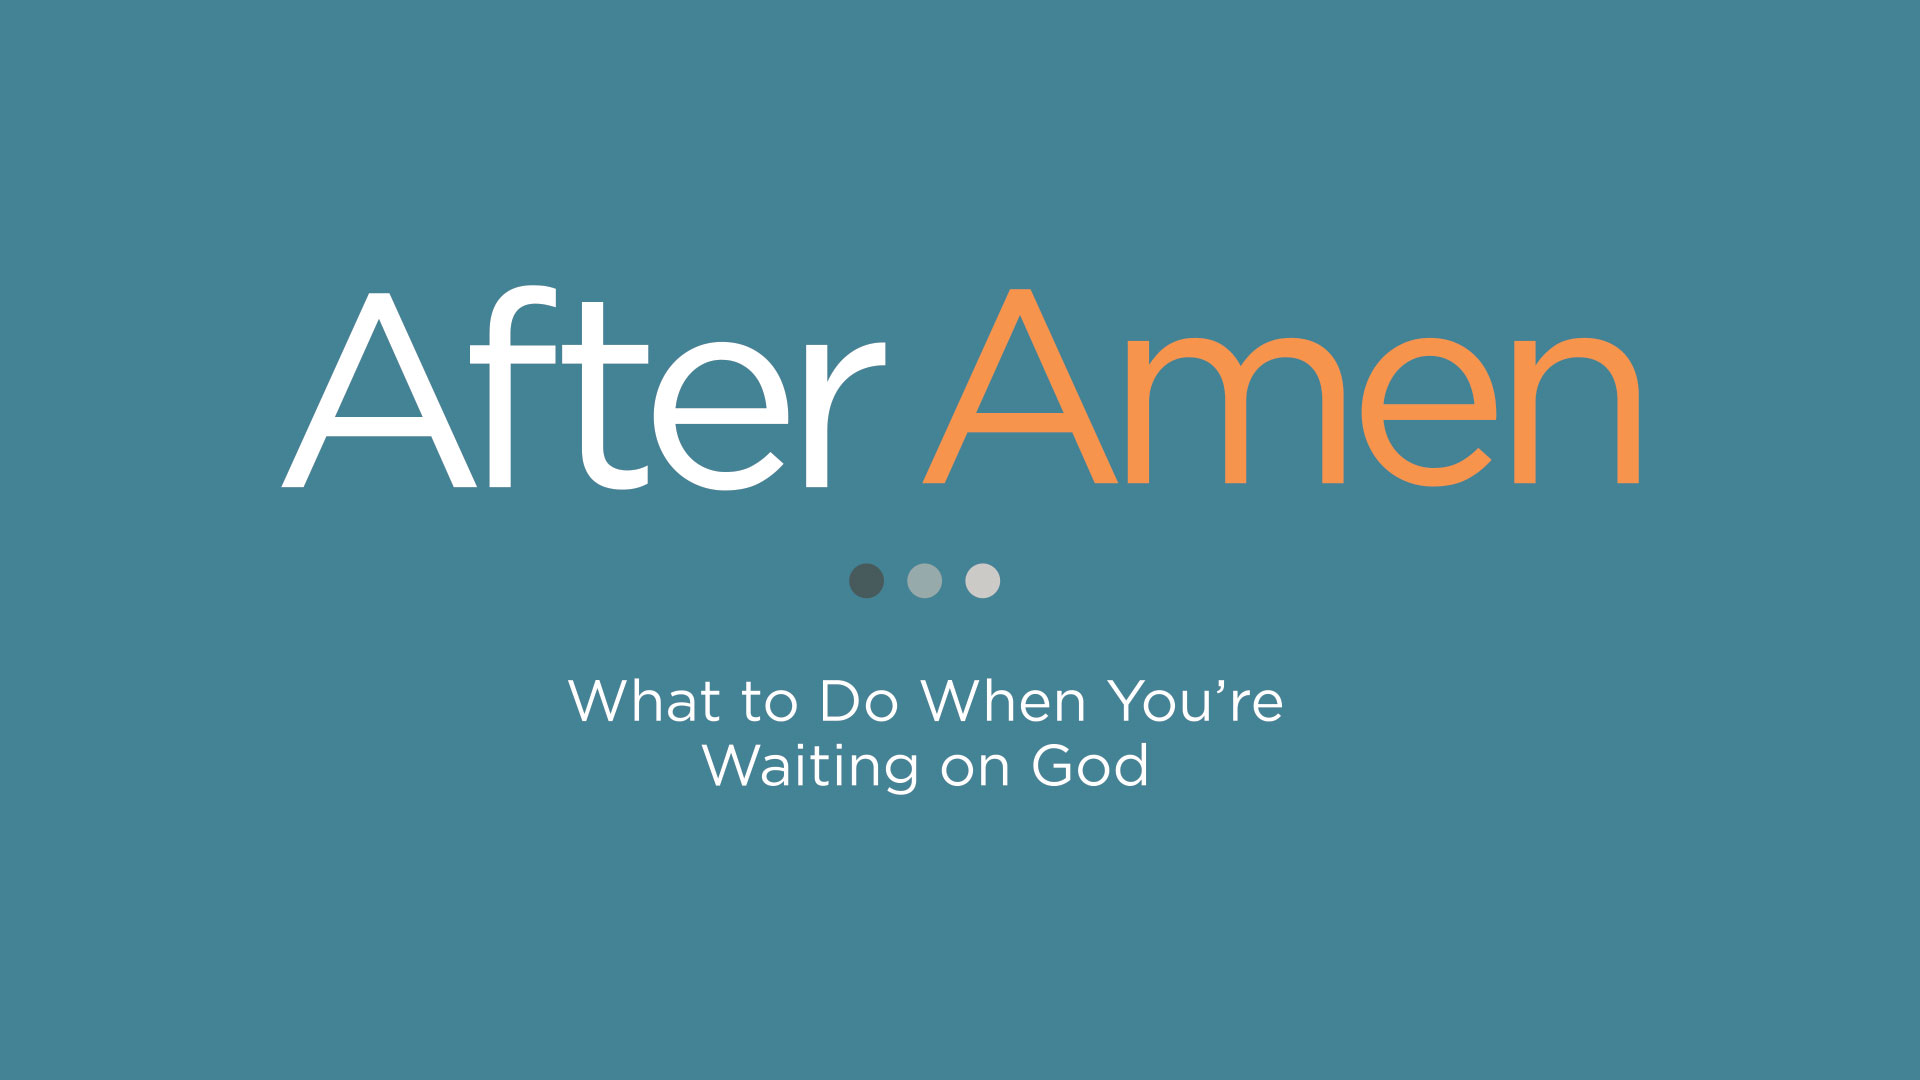 After Amen